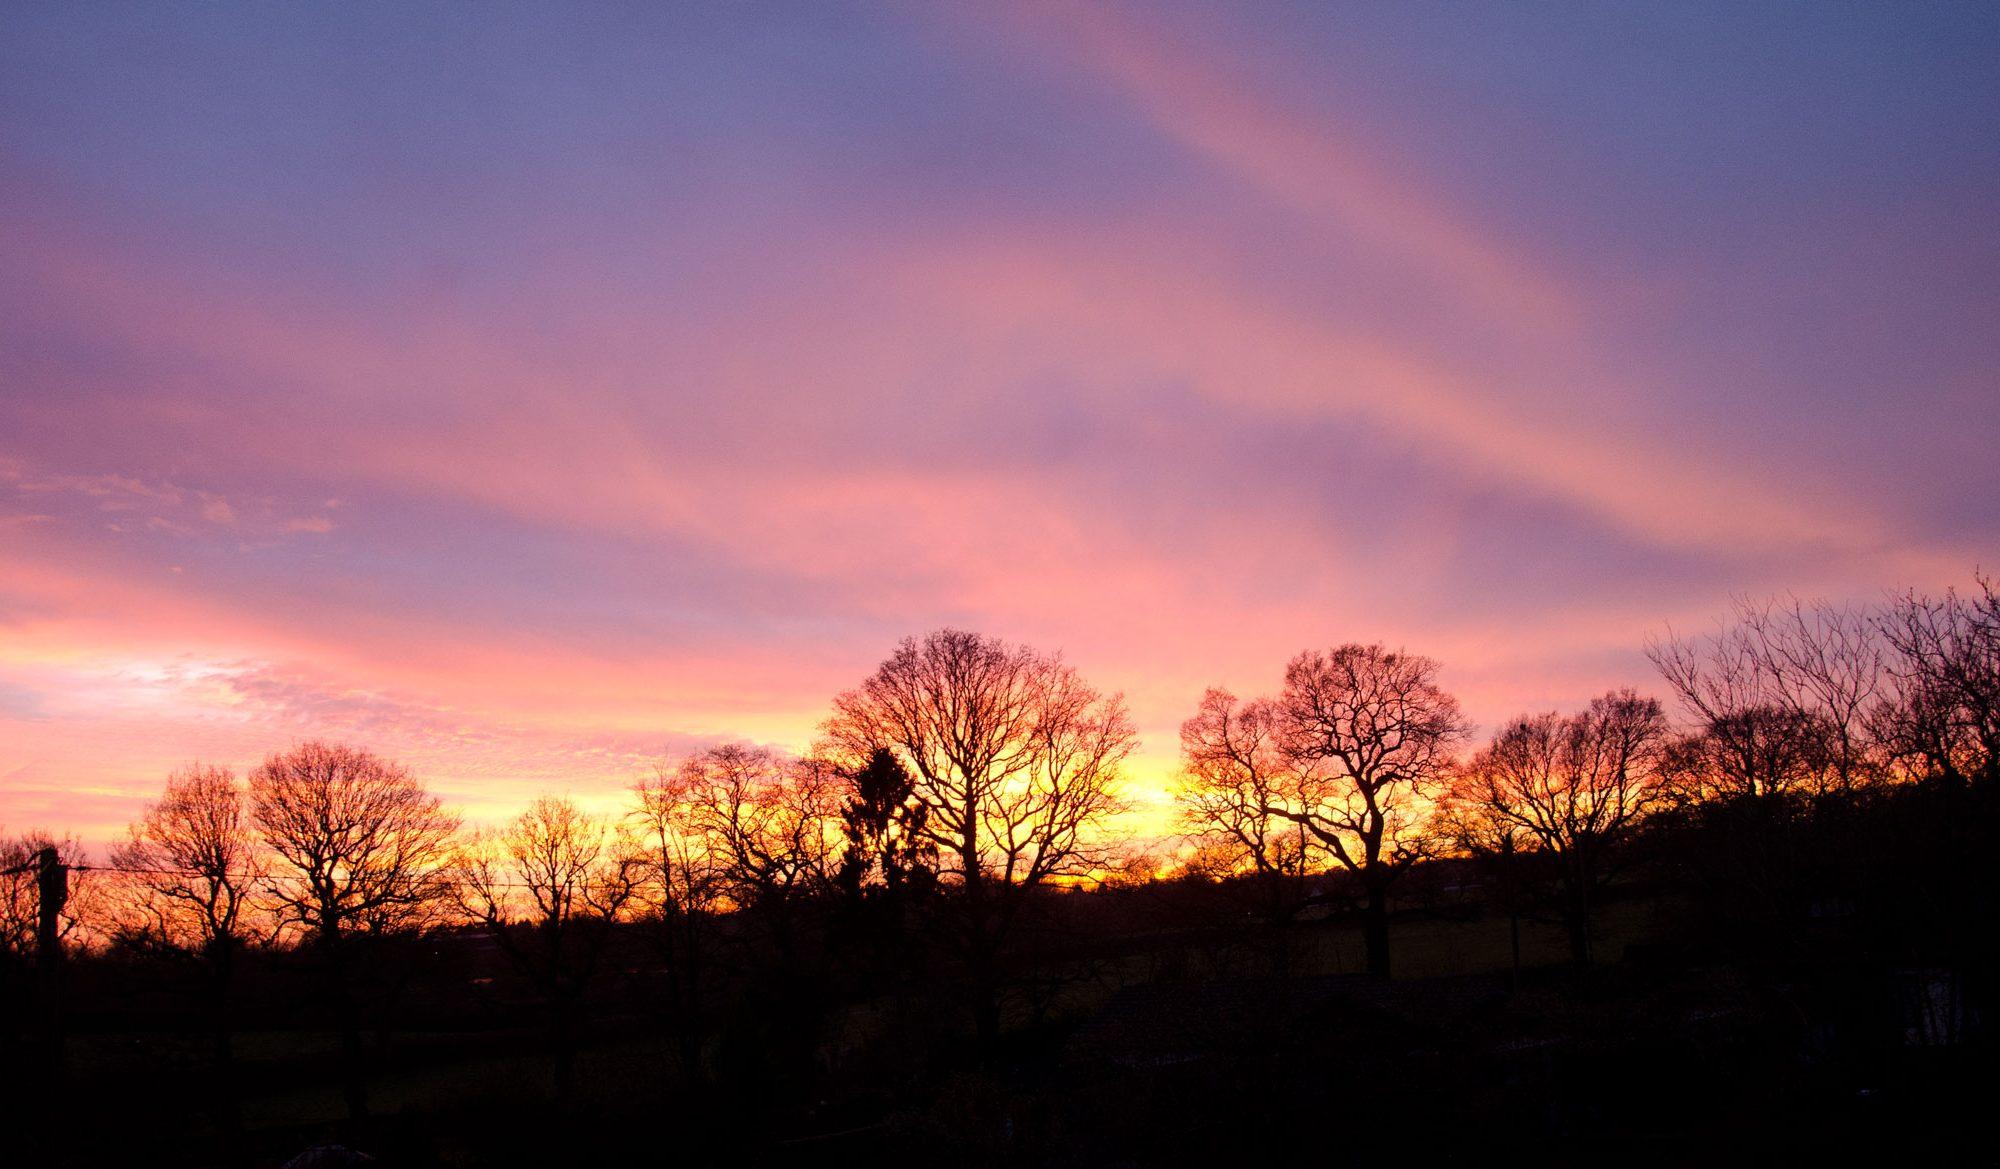 Photo Winter Sunset over Hogspudding Lane © Chris Collis